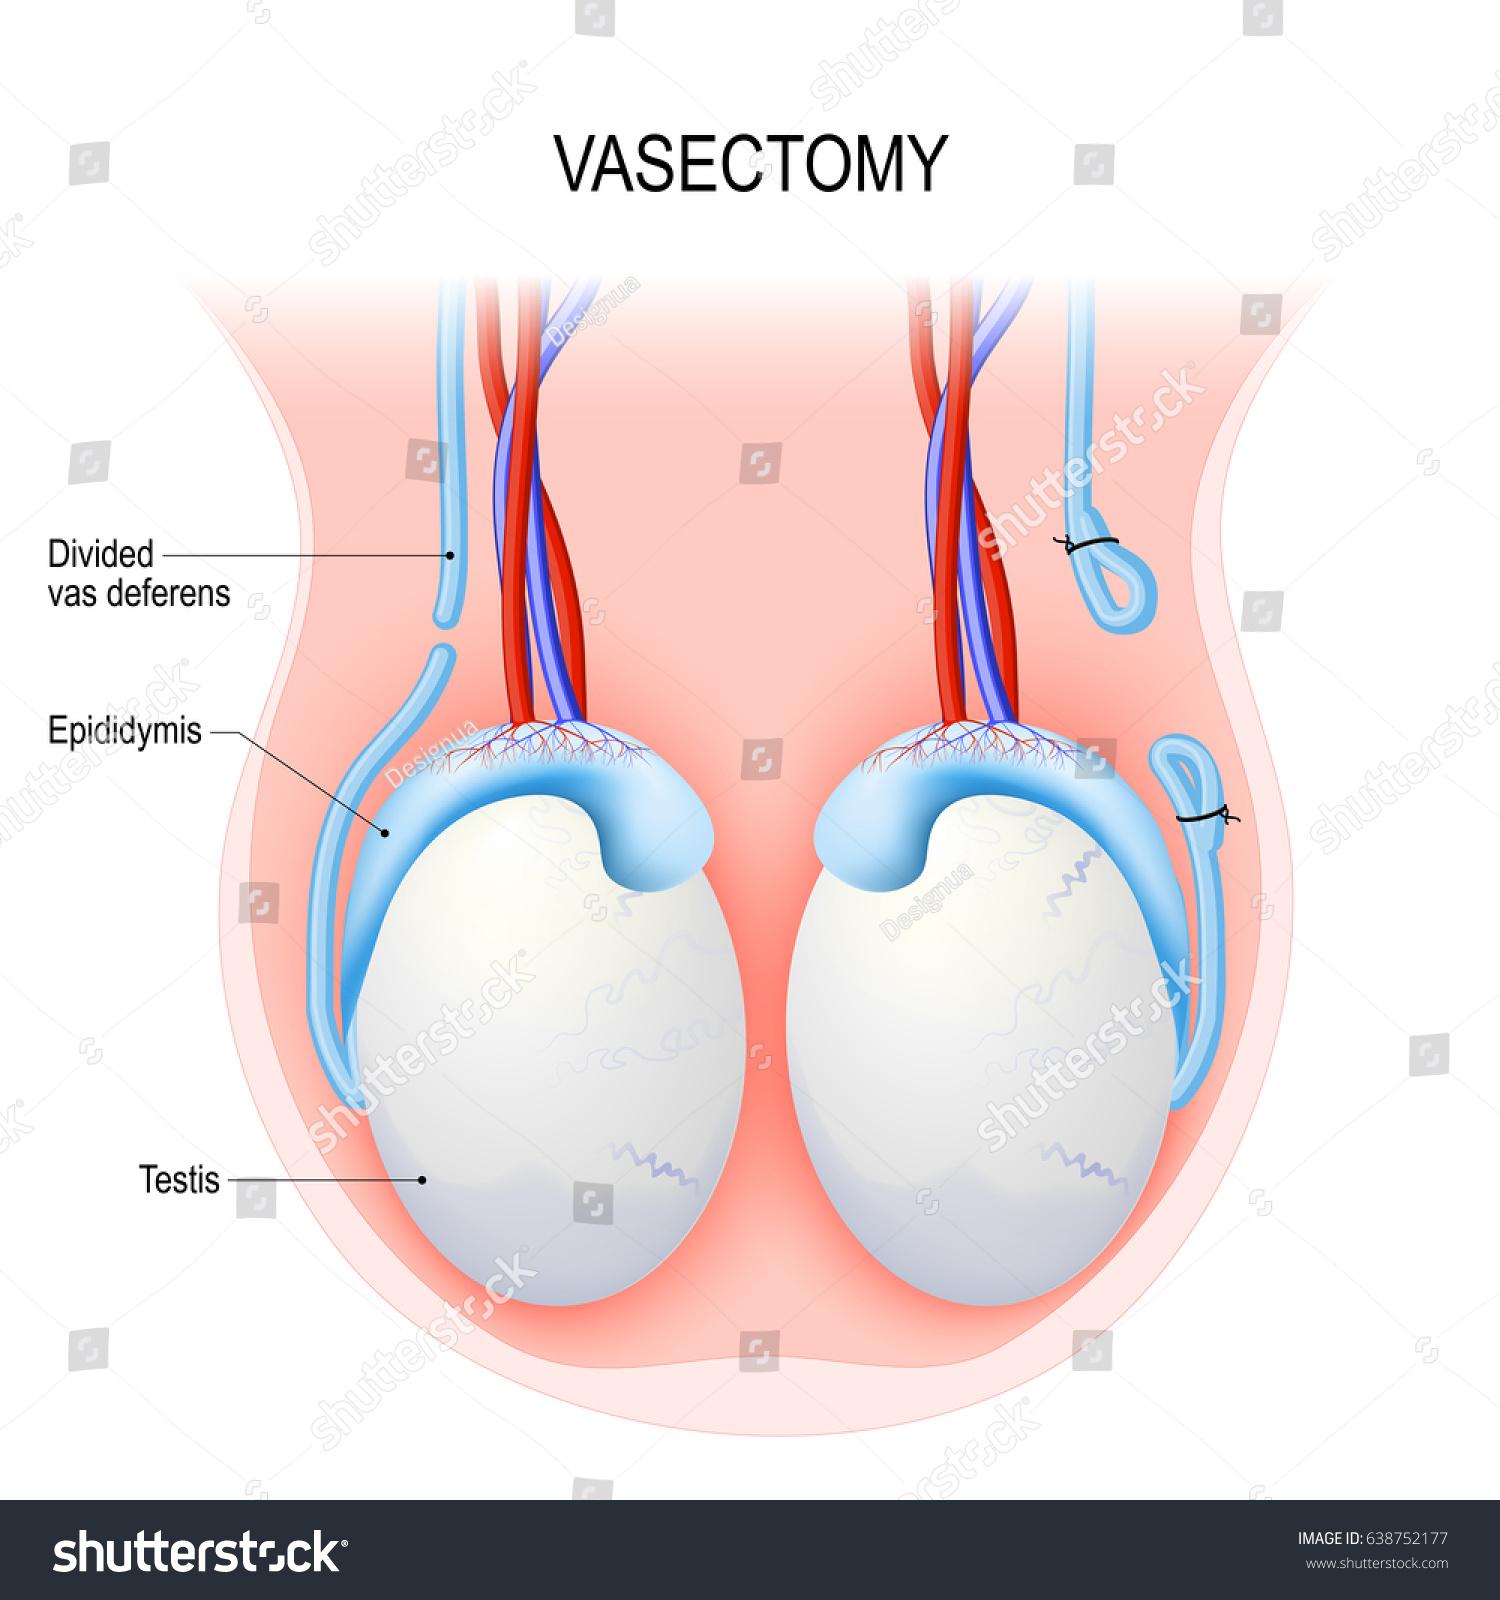 Vas Deferens Diagram Vasectomy Surgi...